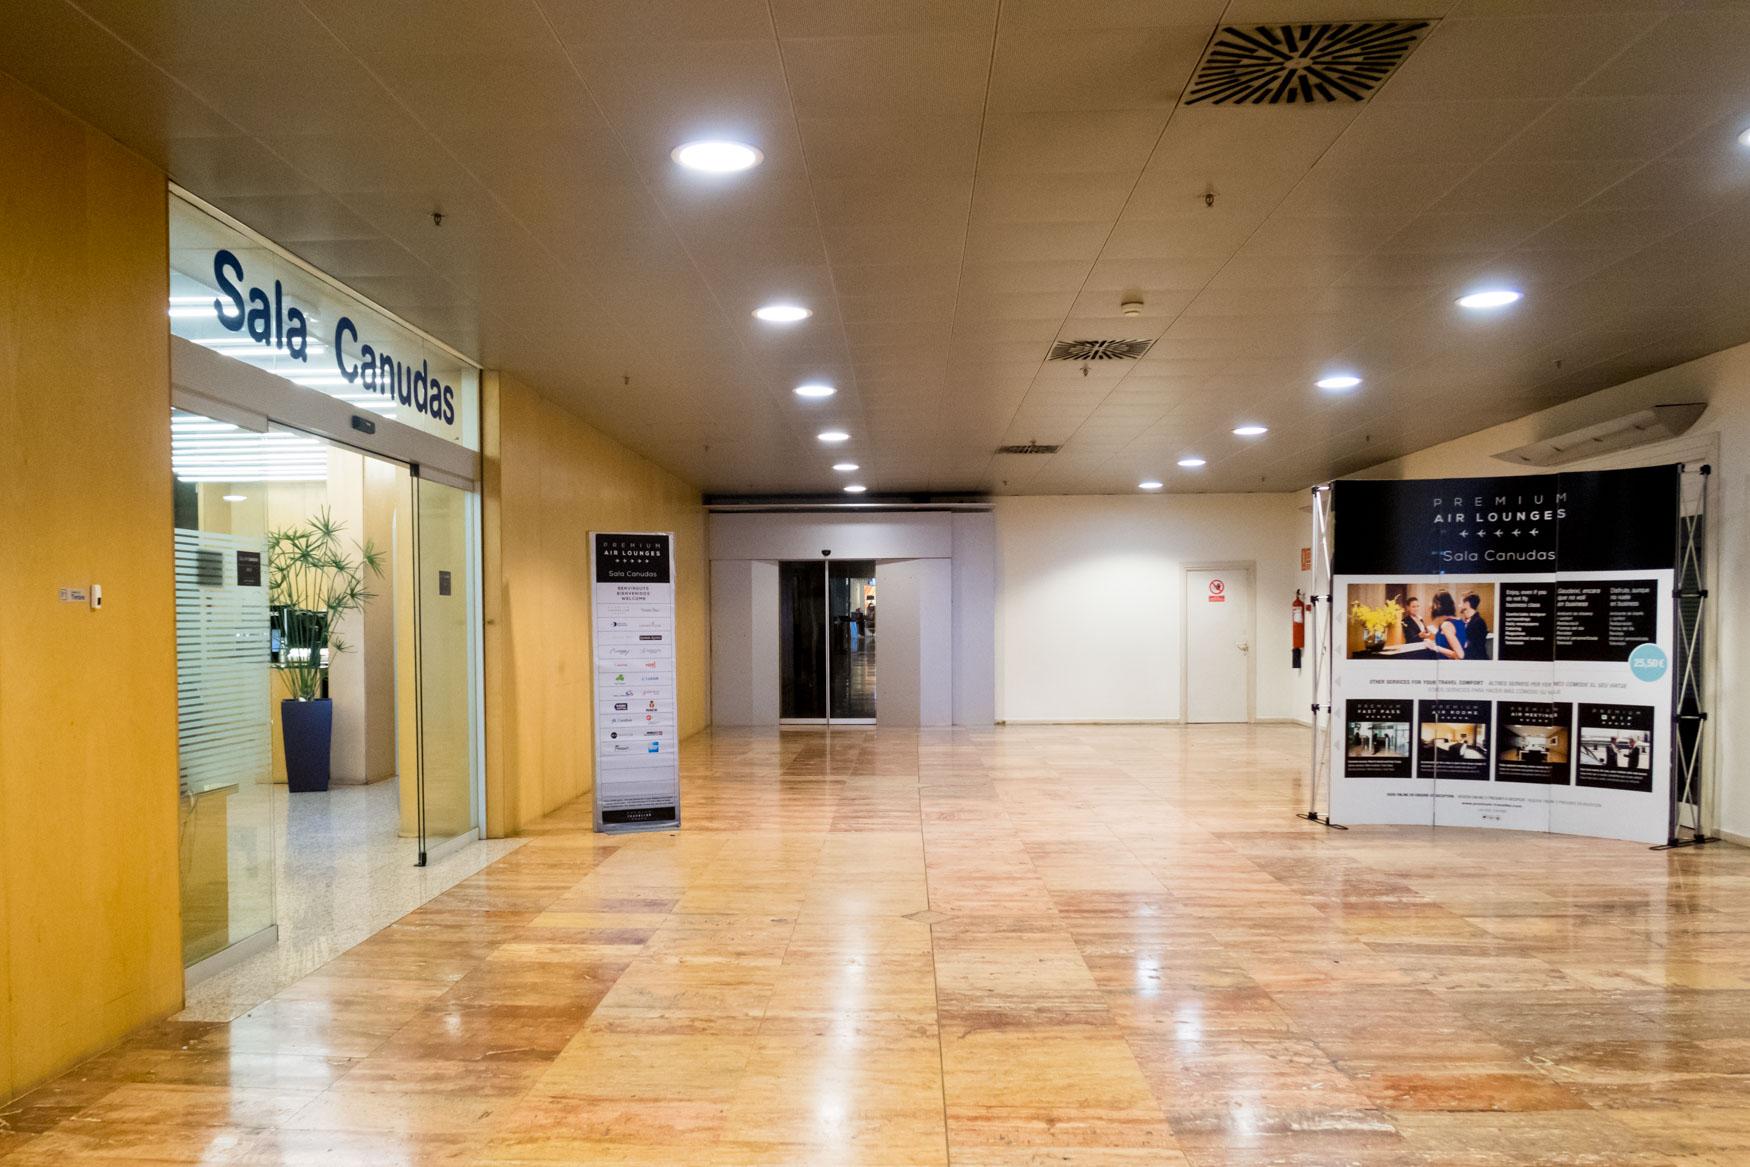 Entrance to Sala VIP Canudas at Barcelona El Prat